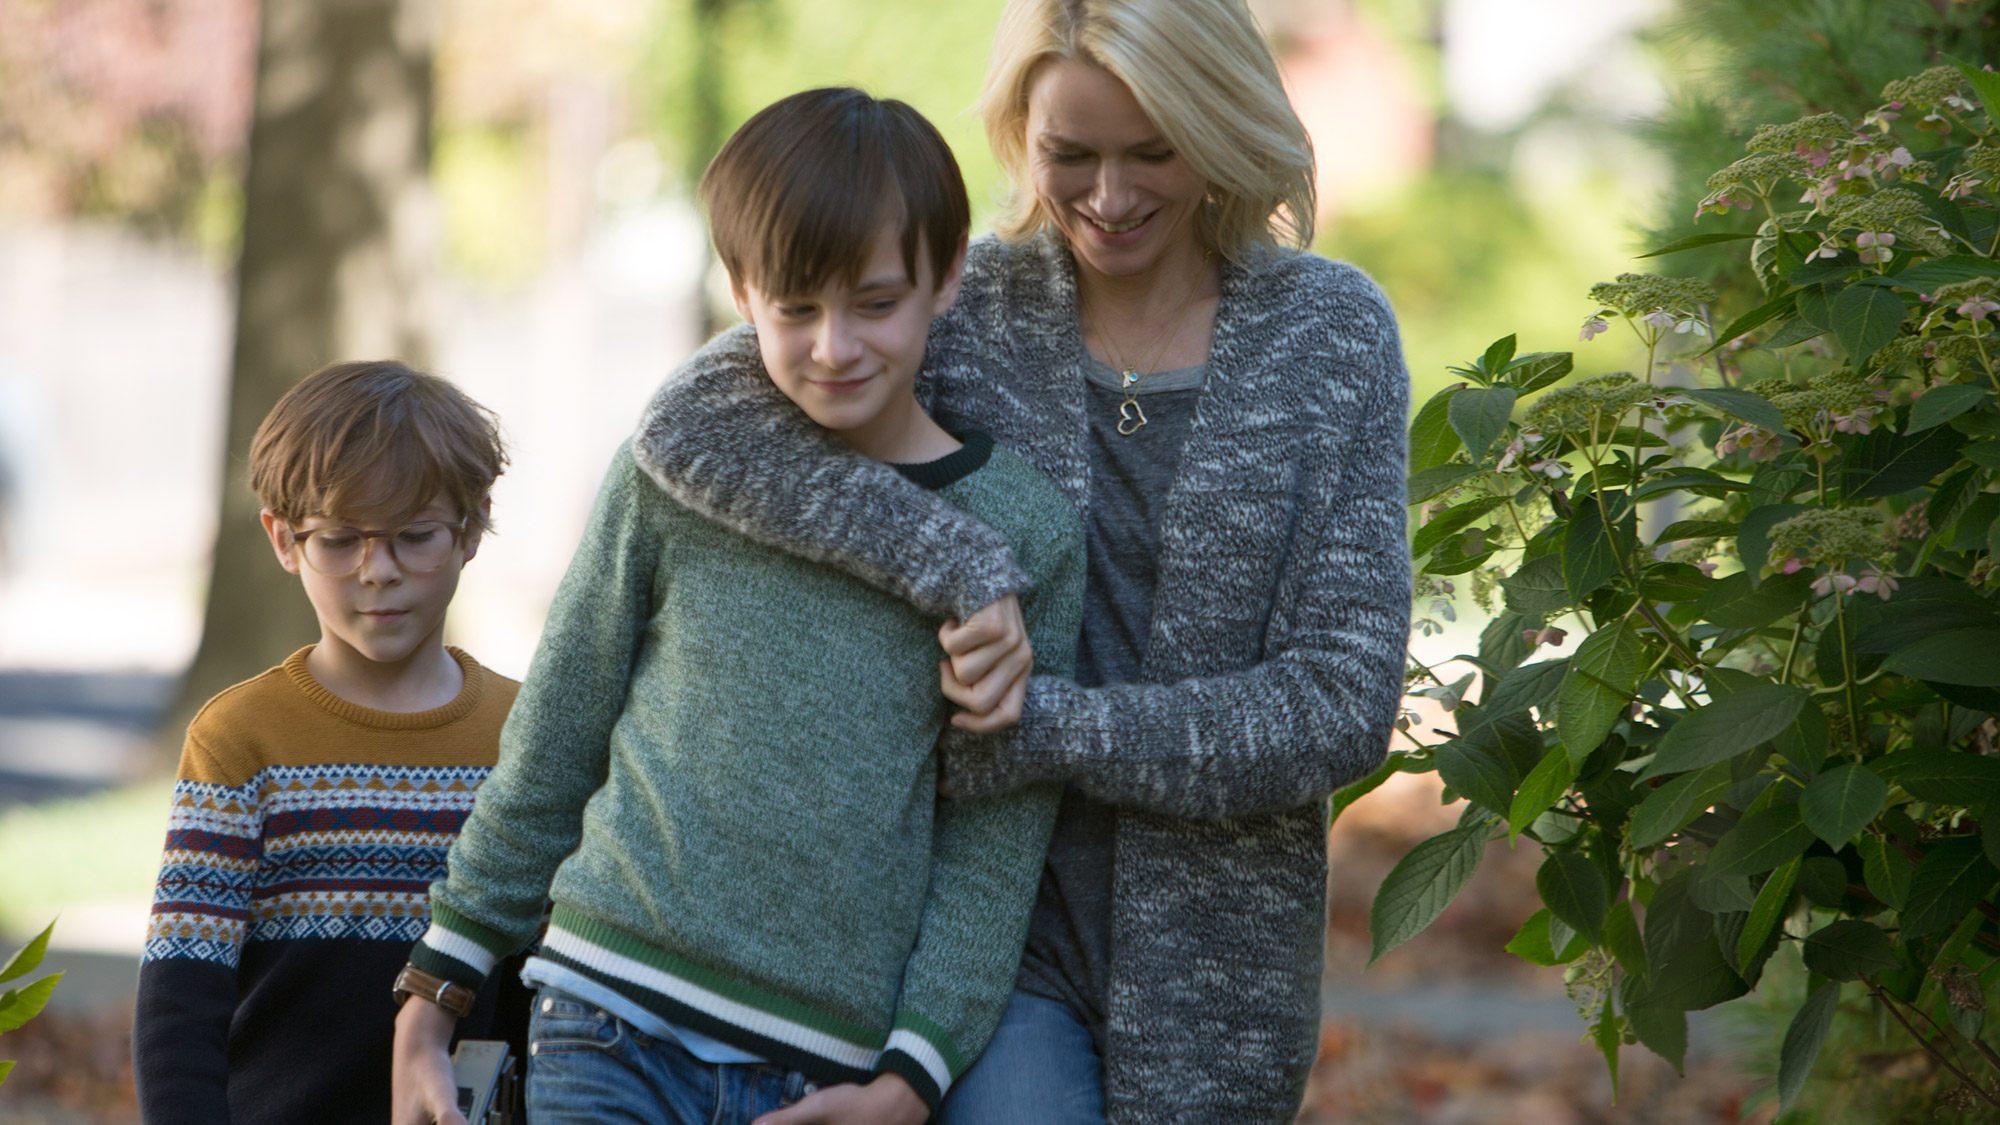 Naomi Watts puts her around a young boy